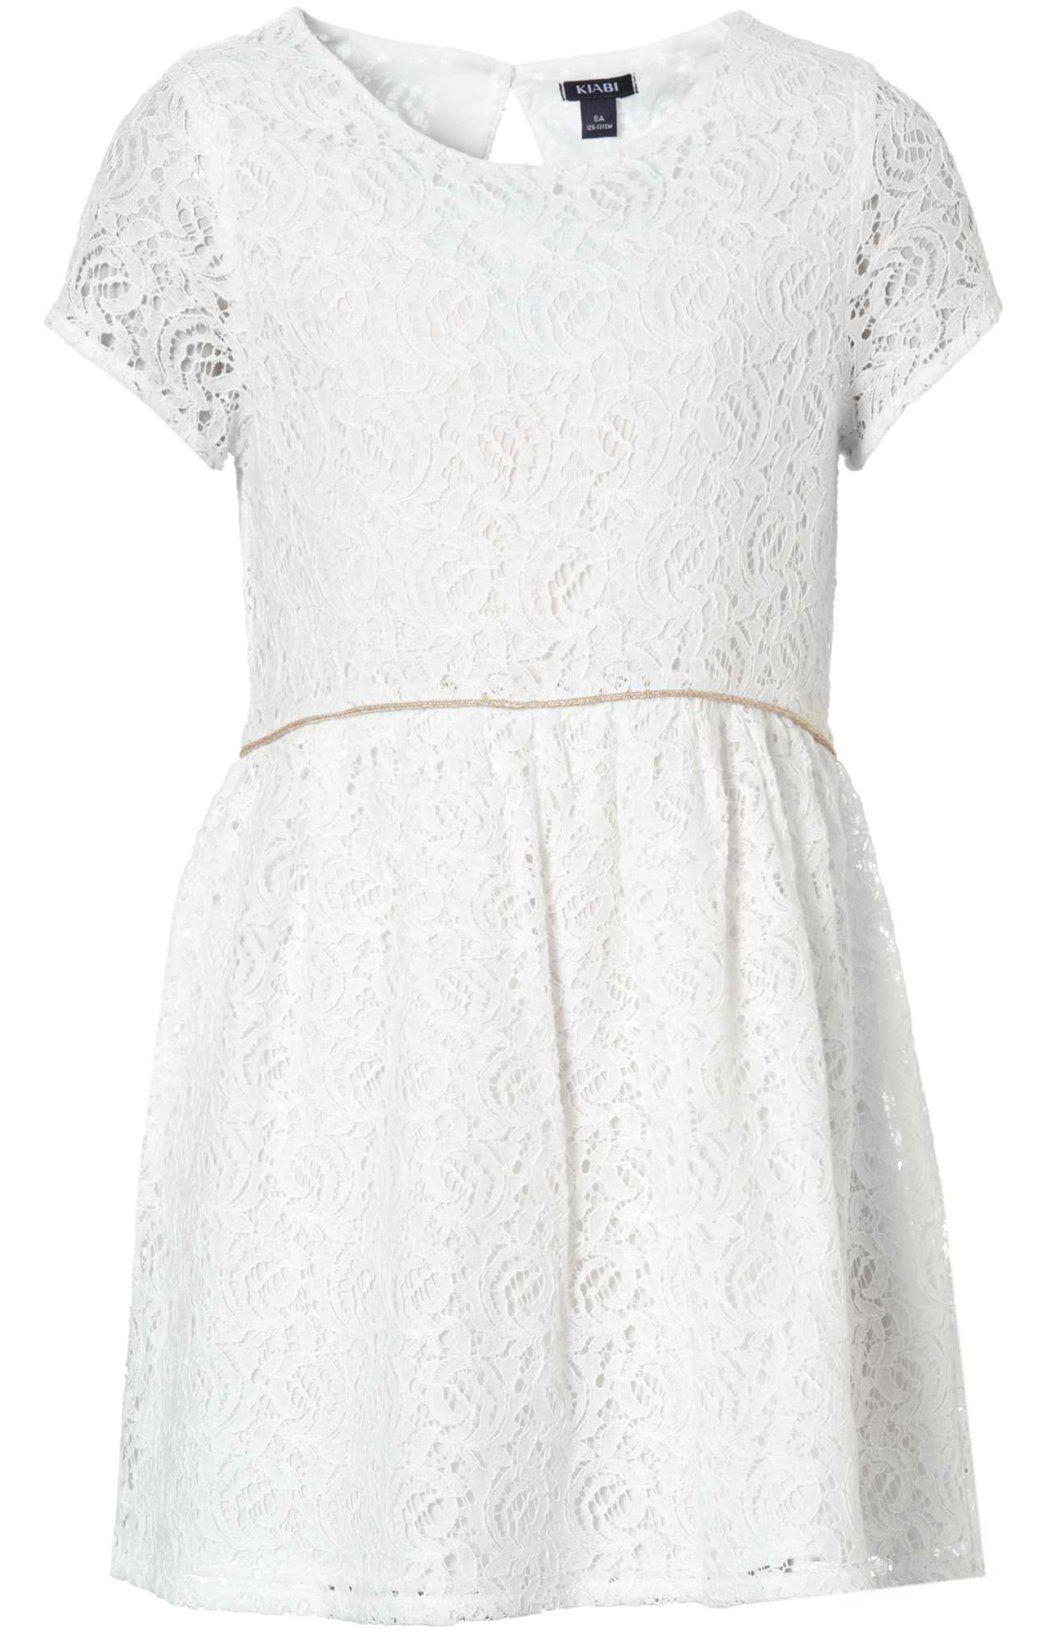 robe pour fille kiabi robe sans manches deep dye blancrose deep and dye bebe fille. Black Bedroom Furniture Sets. Home Design Ideas